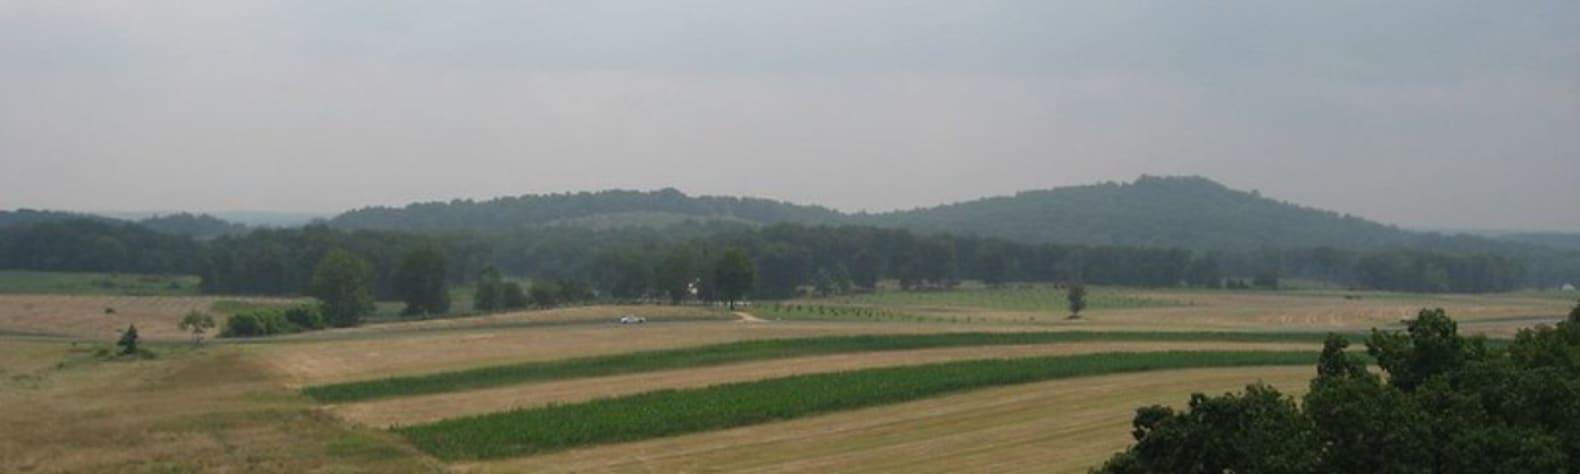 Battle Hill National Historic Site